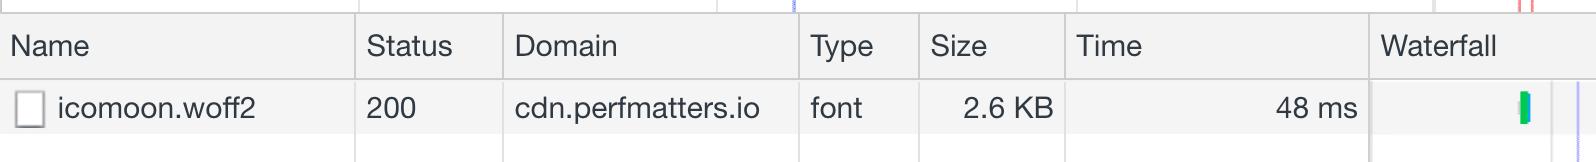 Tamaño del archivo WOFF 2 de Font Awesome